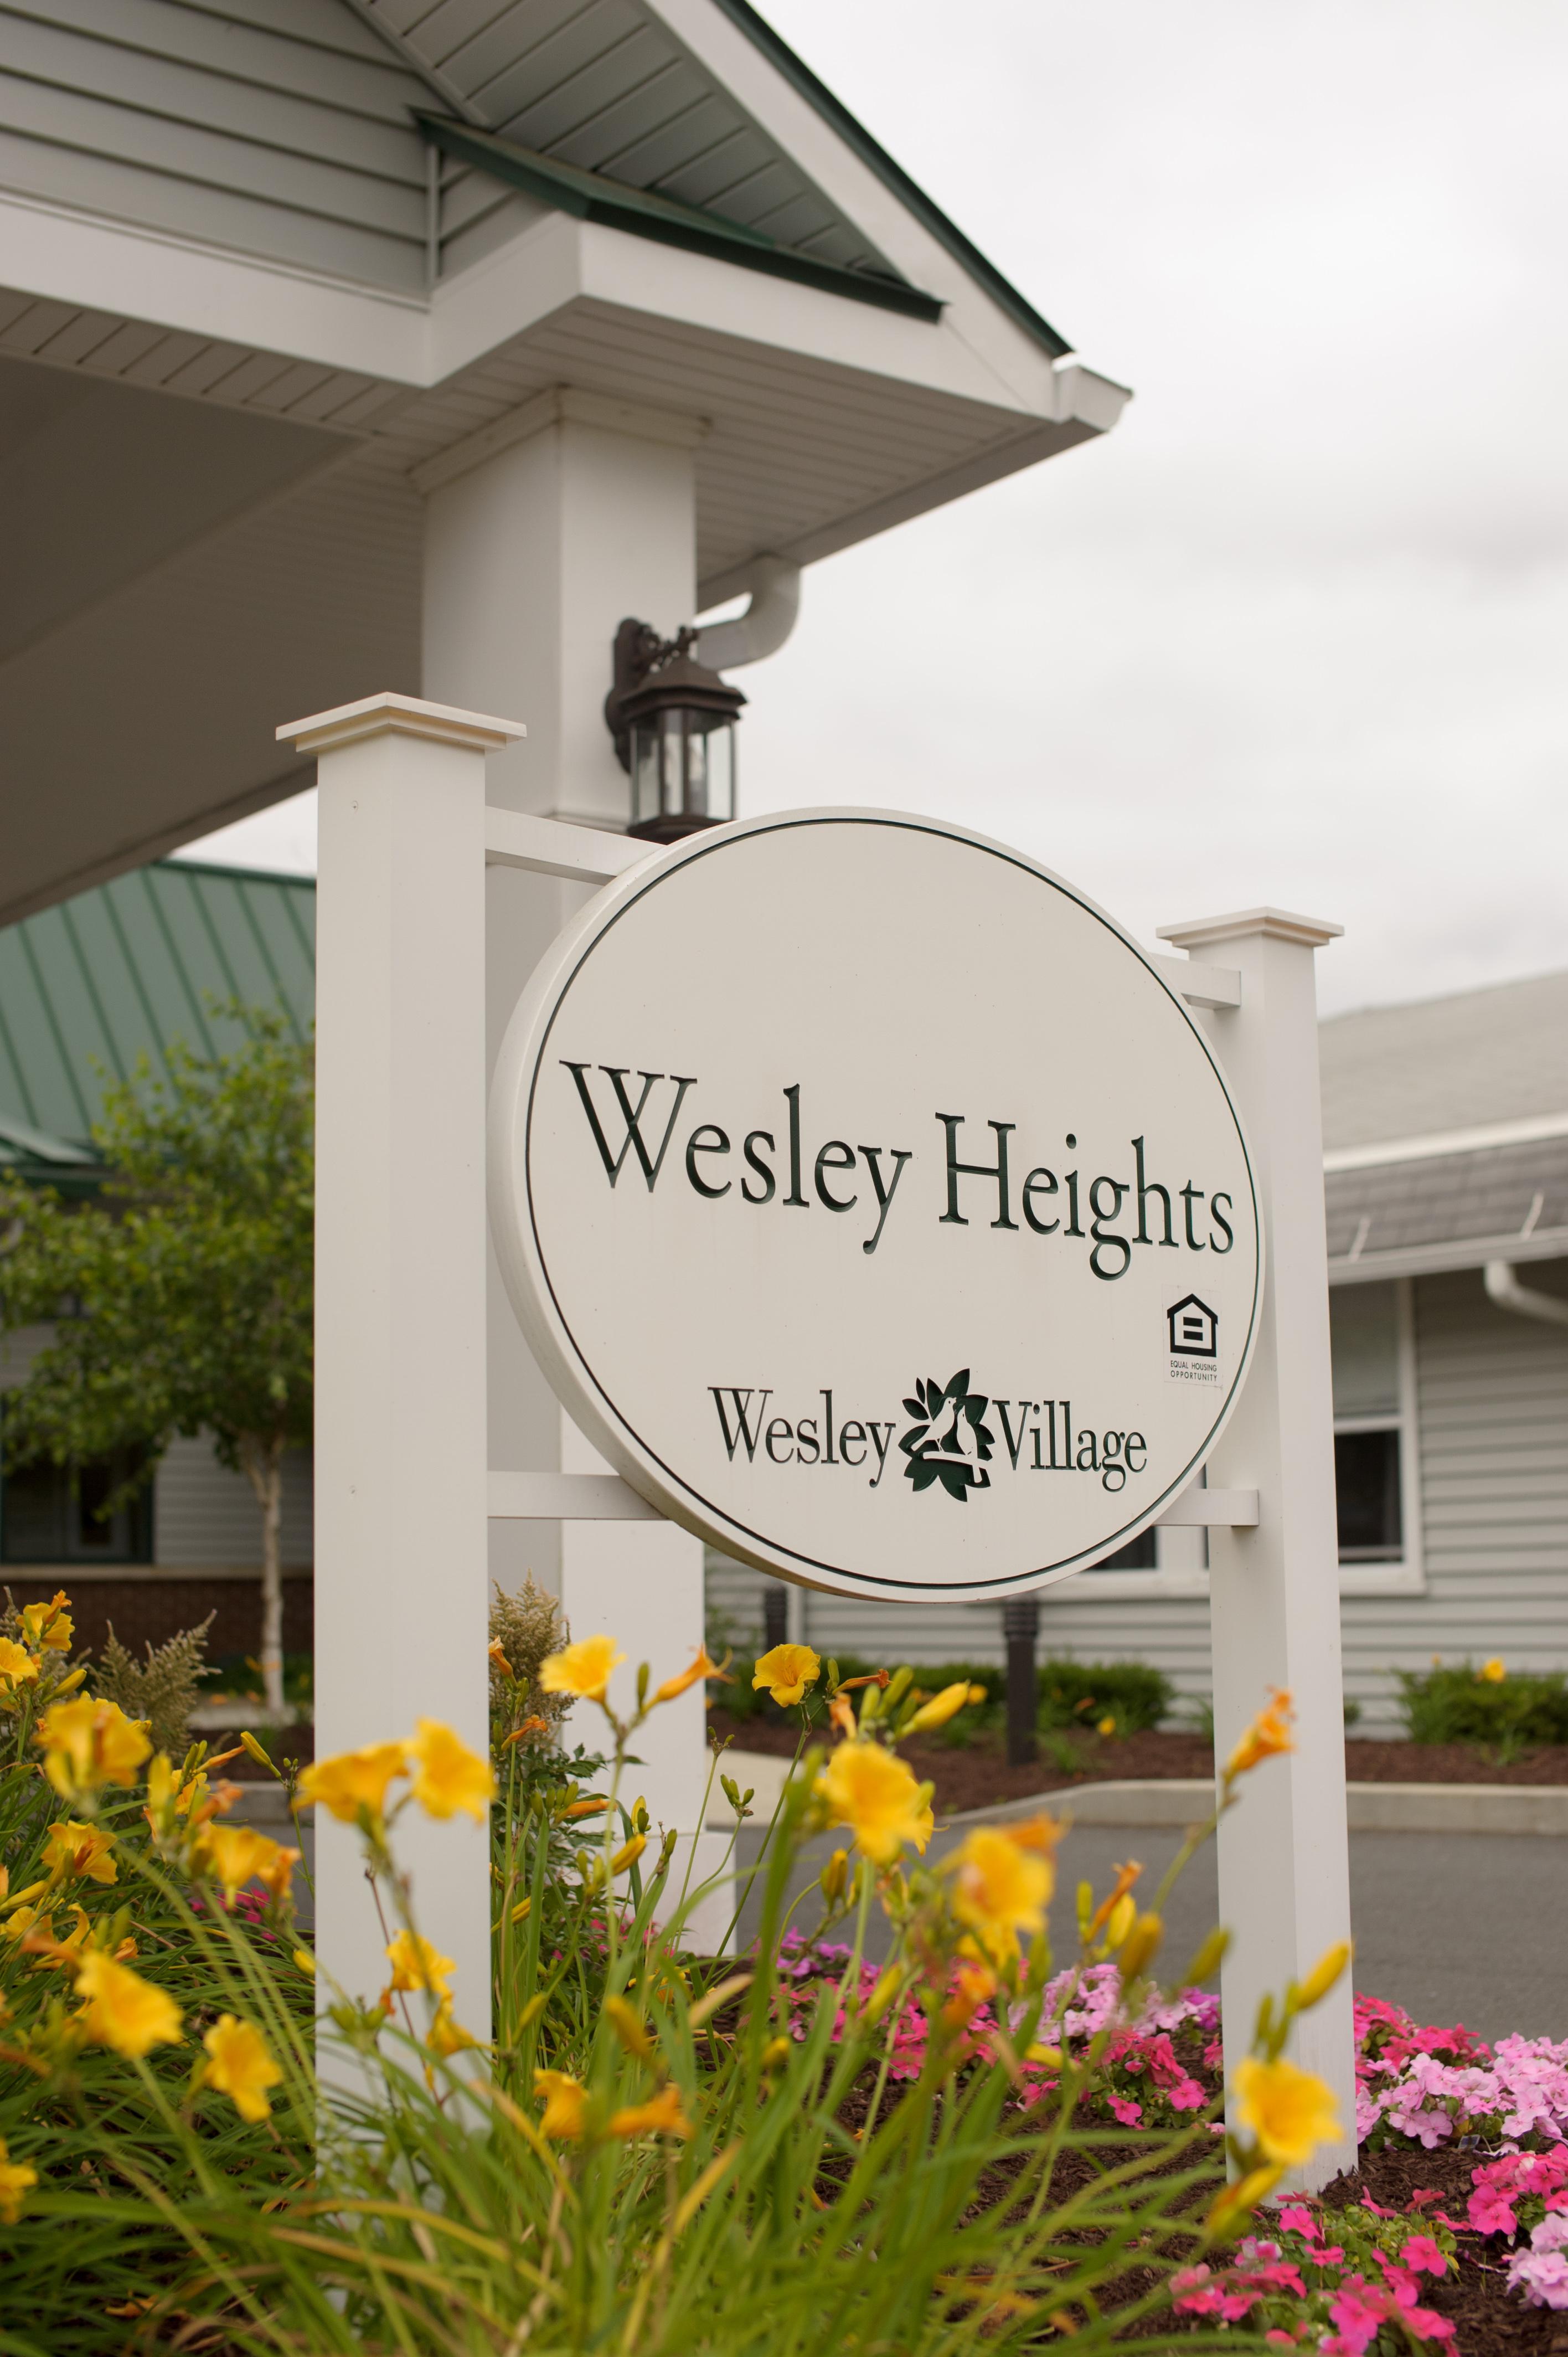 Wesley Village 580 Long Hill Ave, Shelton, CT 06484 - YP.com